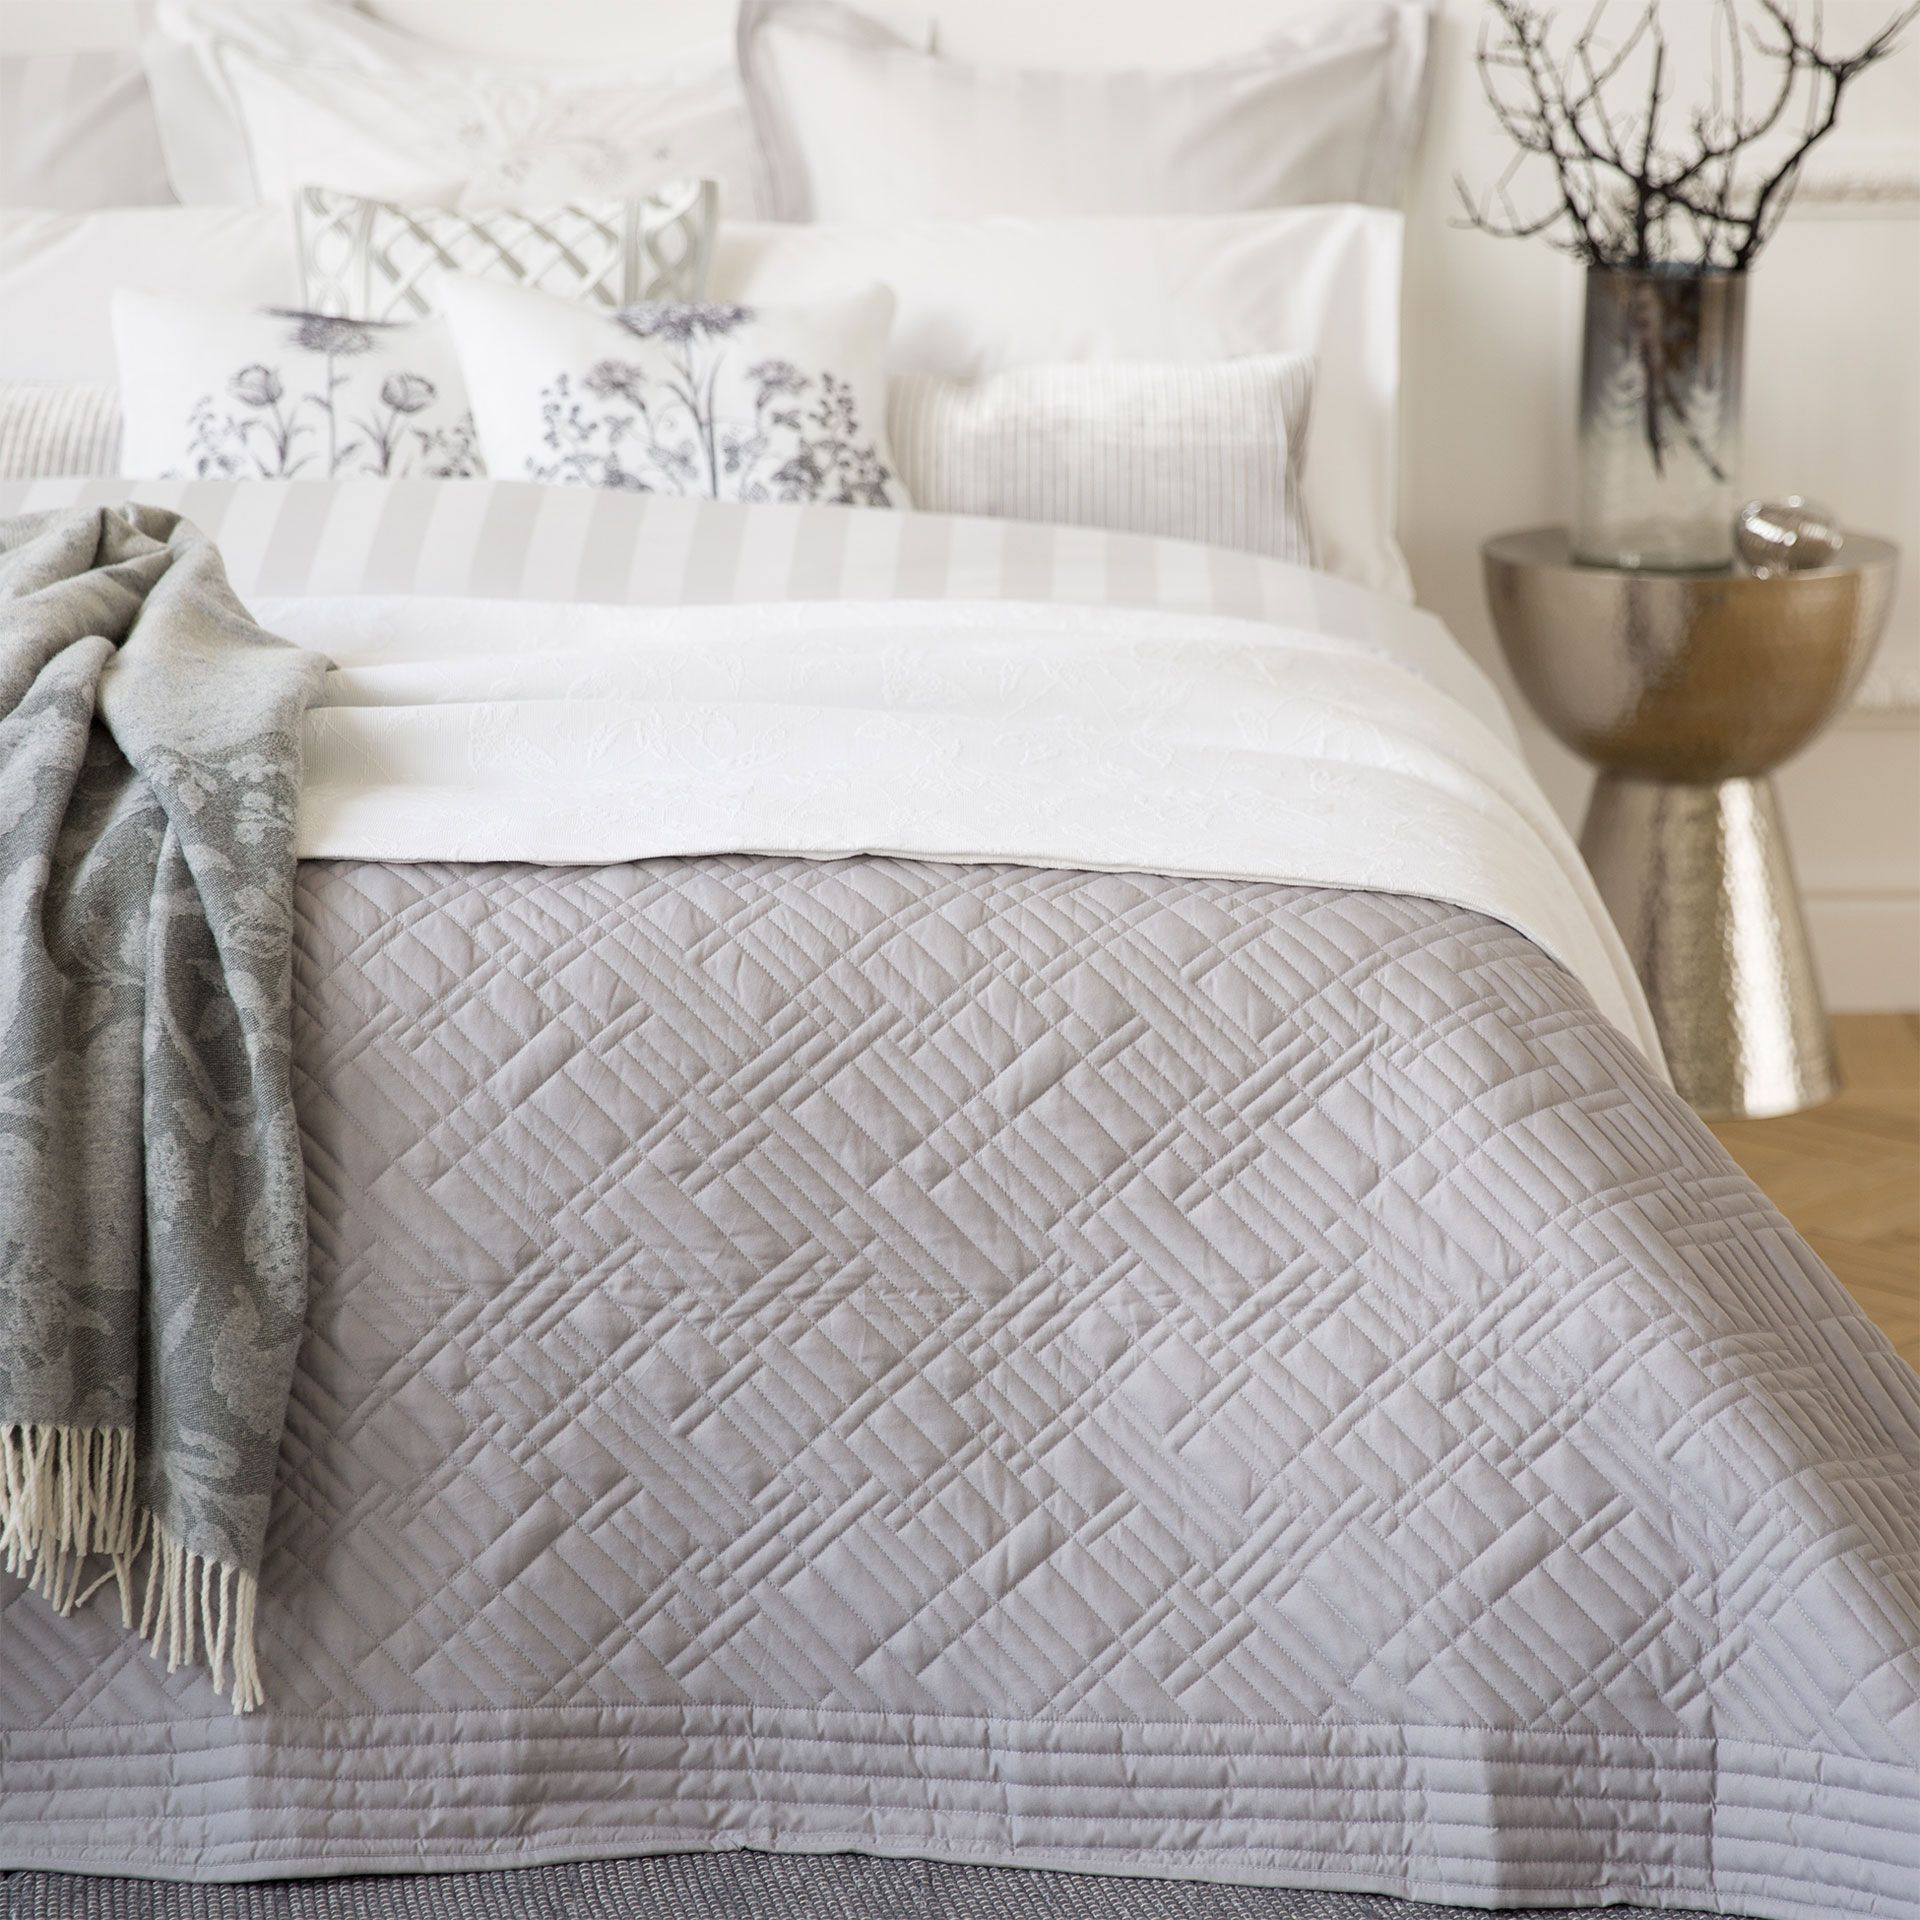 GRIJZE BASIC SPREI  Dekbedden  Bed  Zara Home Holland